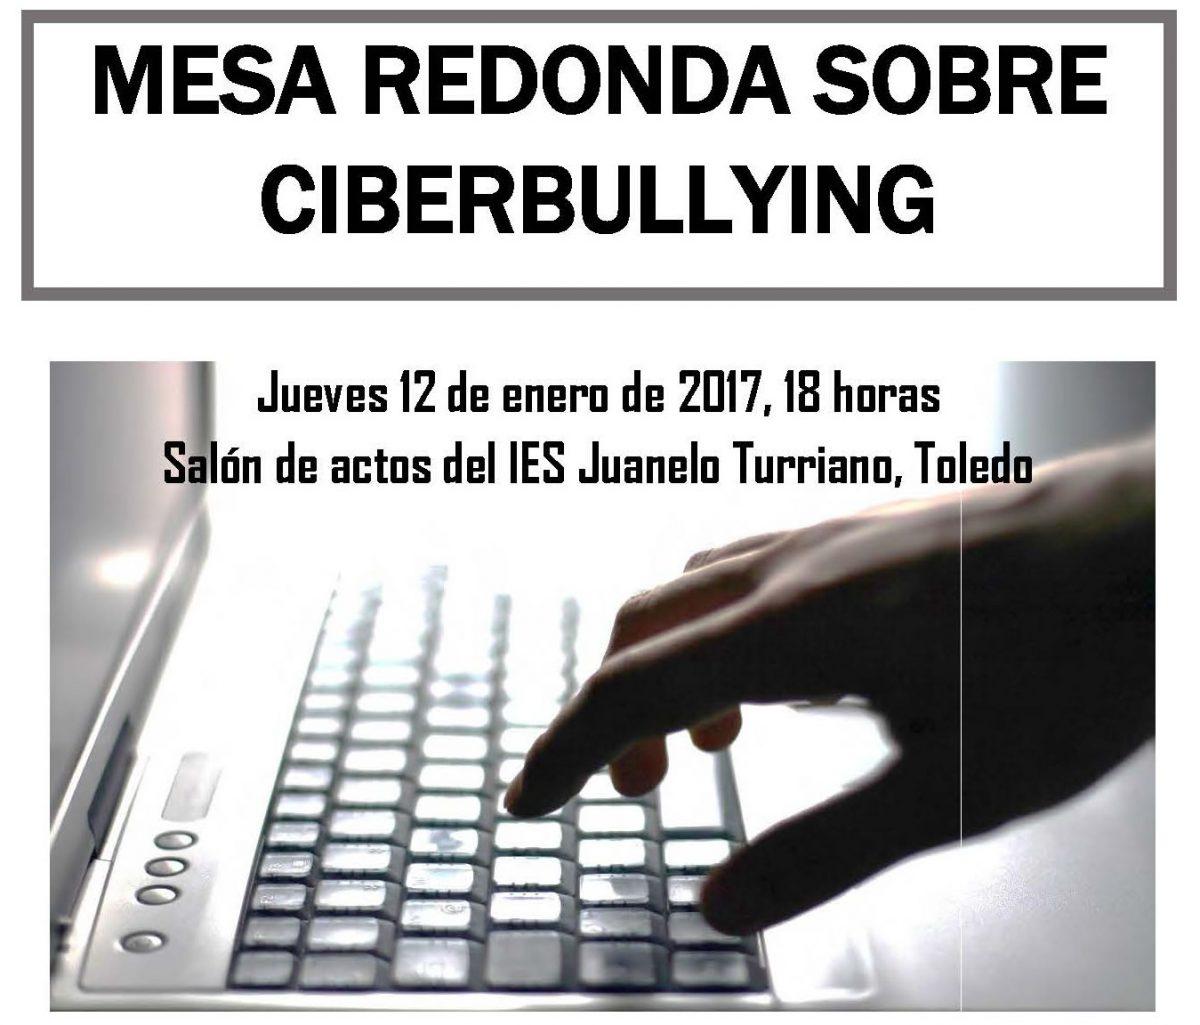 http://www.toledo.es/wp-content/uploads/2017/01/mesa_redonda_sobre_ciberbullying-1200x1025.jpg. Mesa redonda sobre Ciberbullying